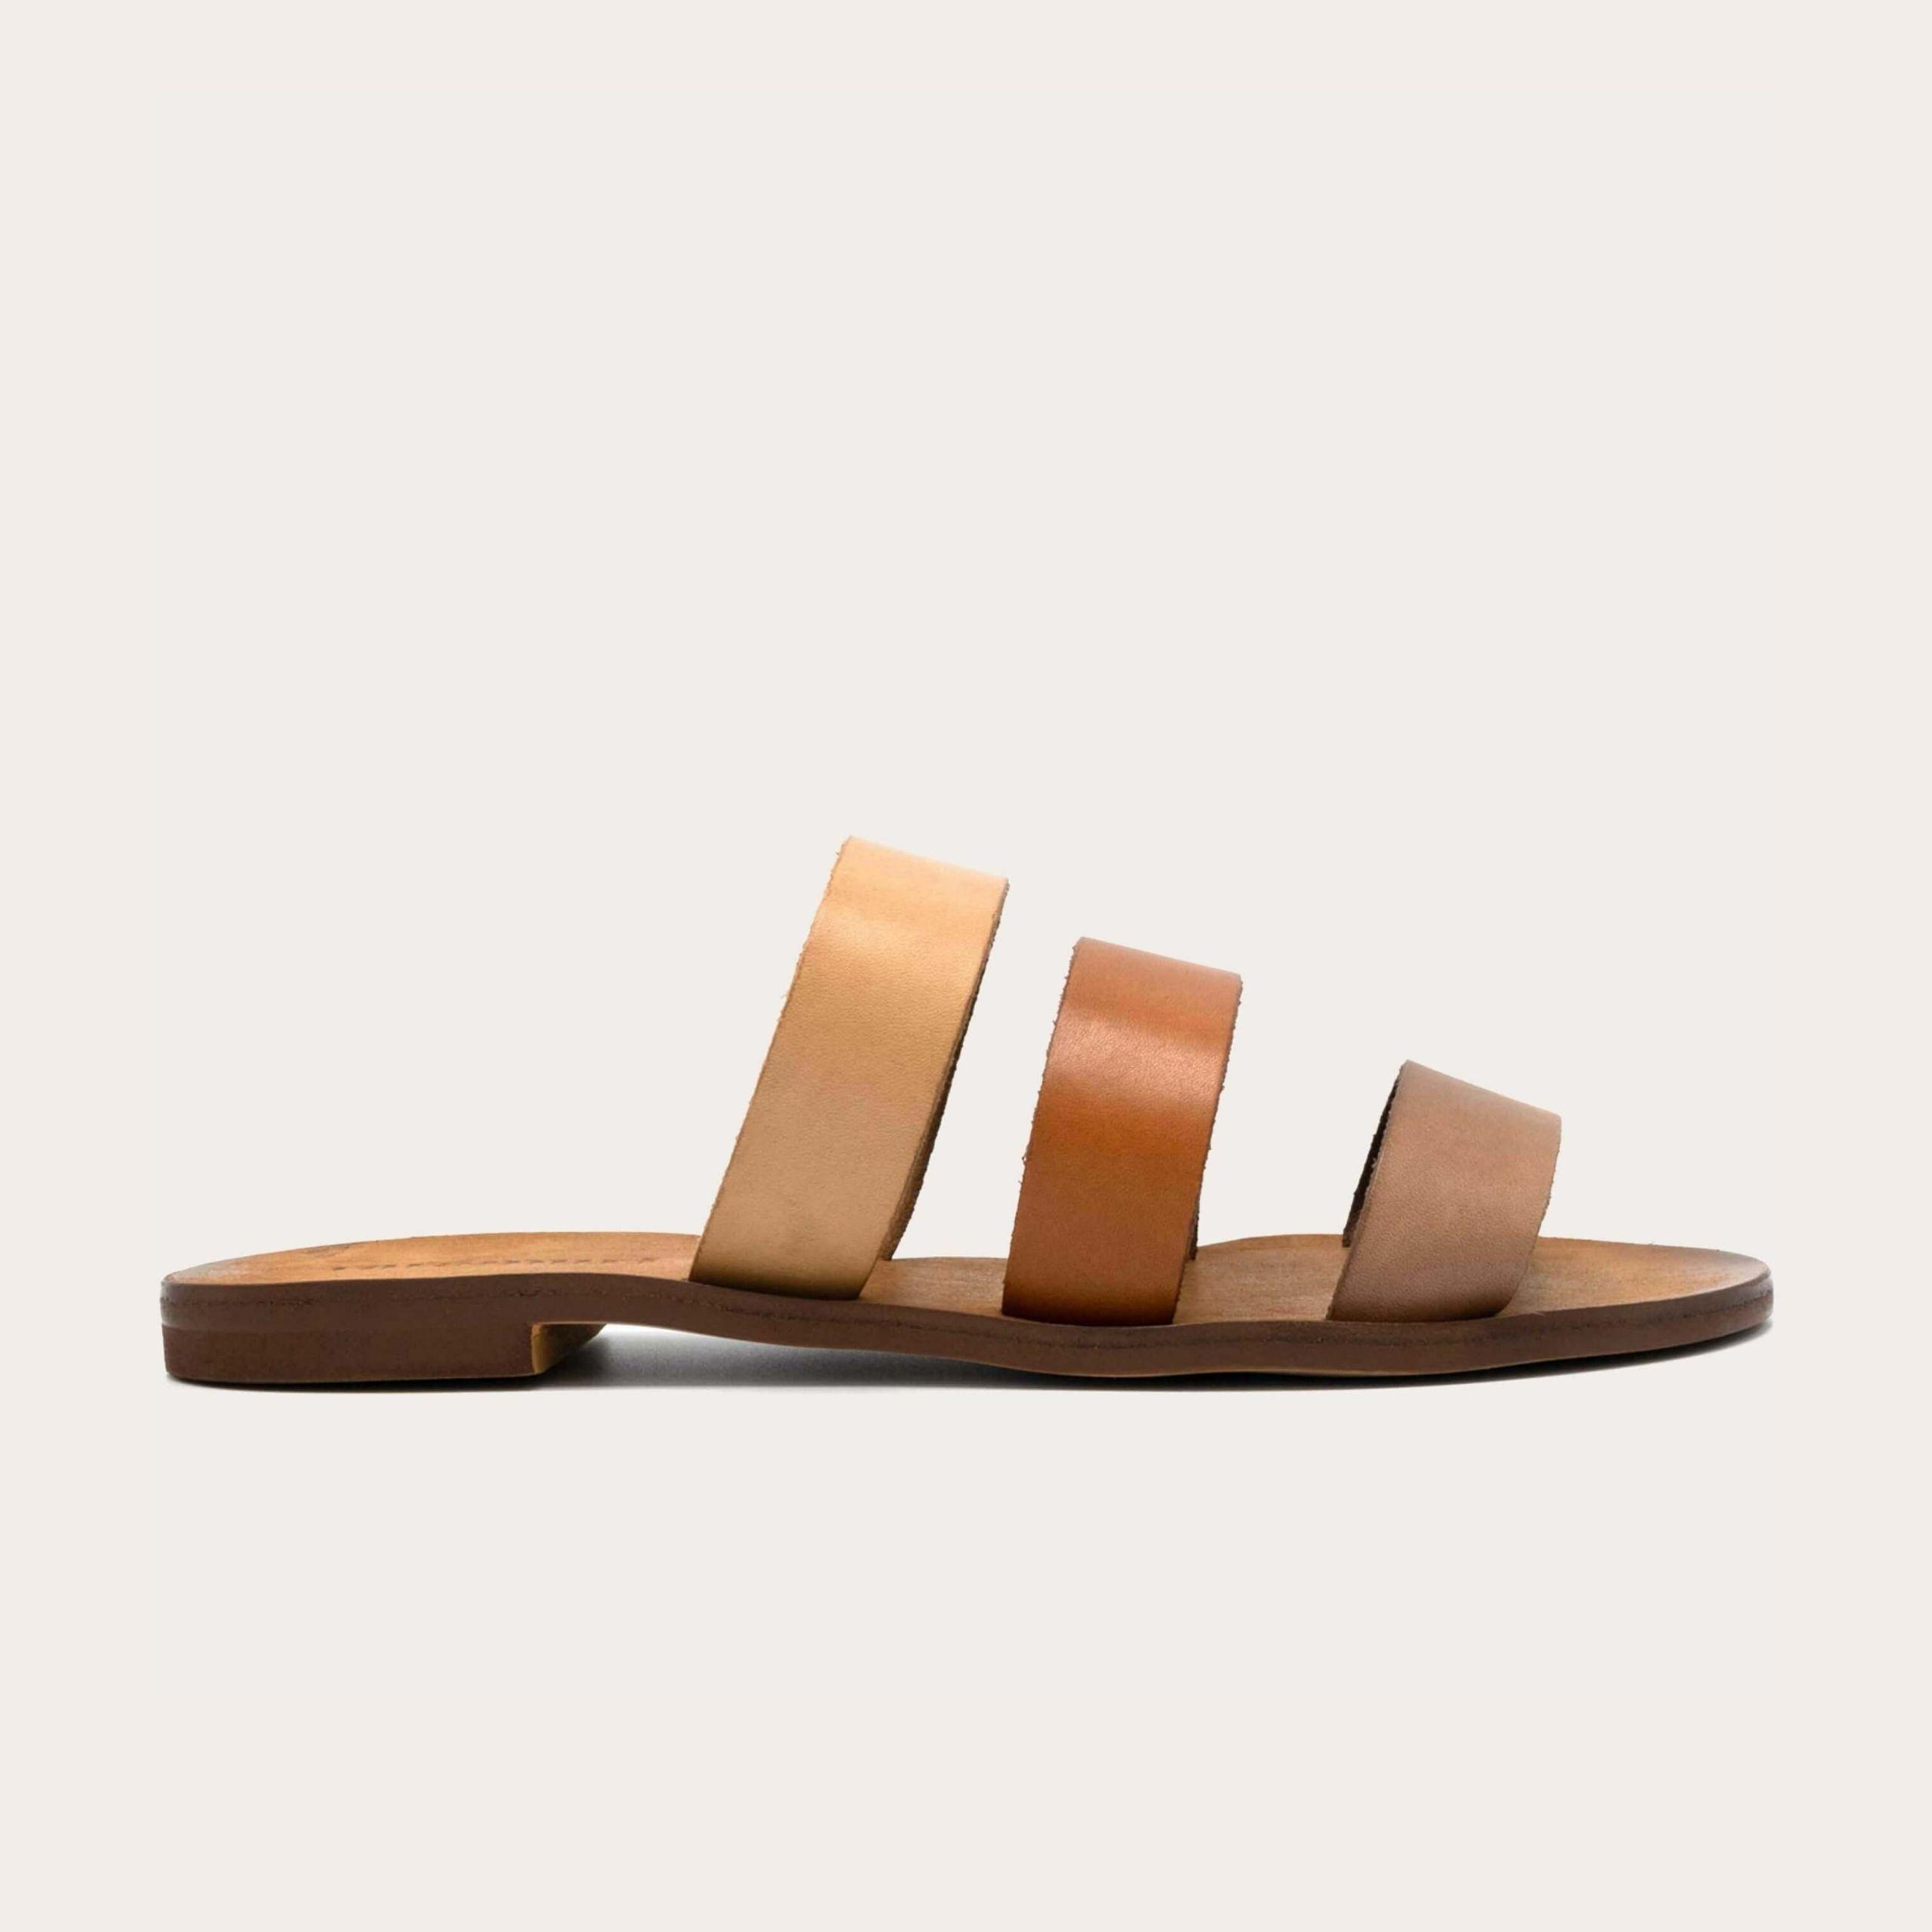 tijuana_1_lintsandalen sandals travelsandals vegan sustainable sandals wikkelsandalen